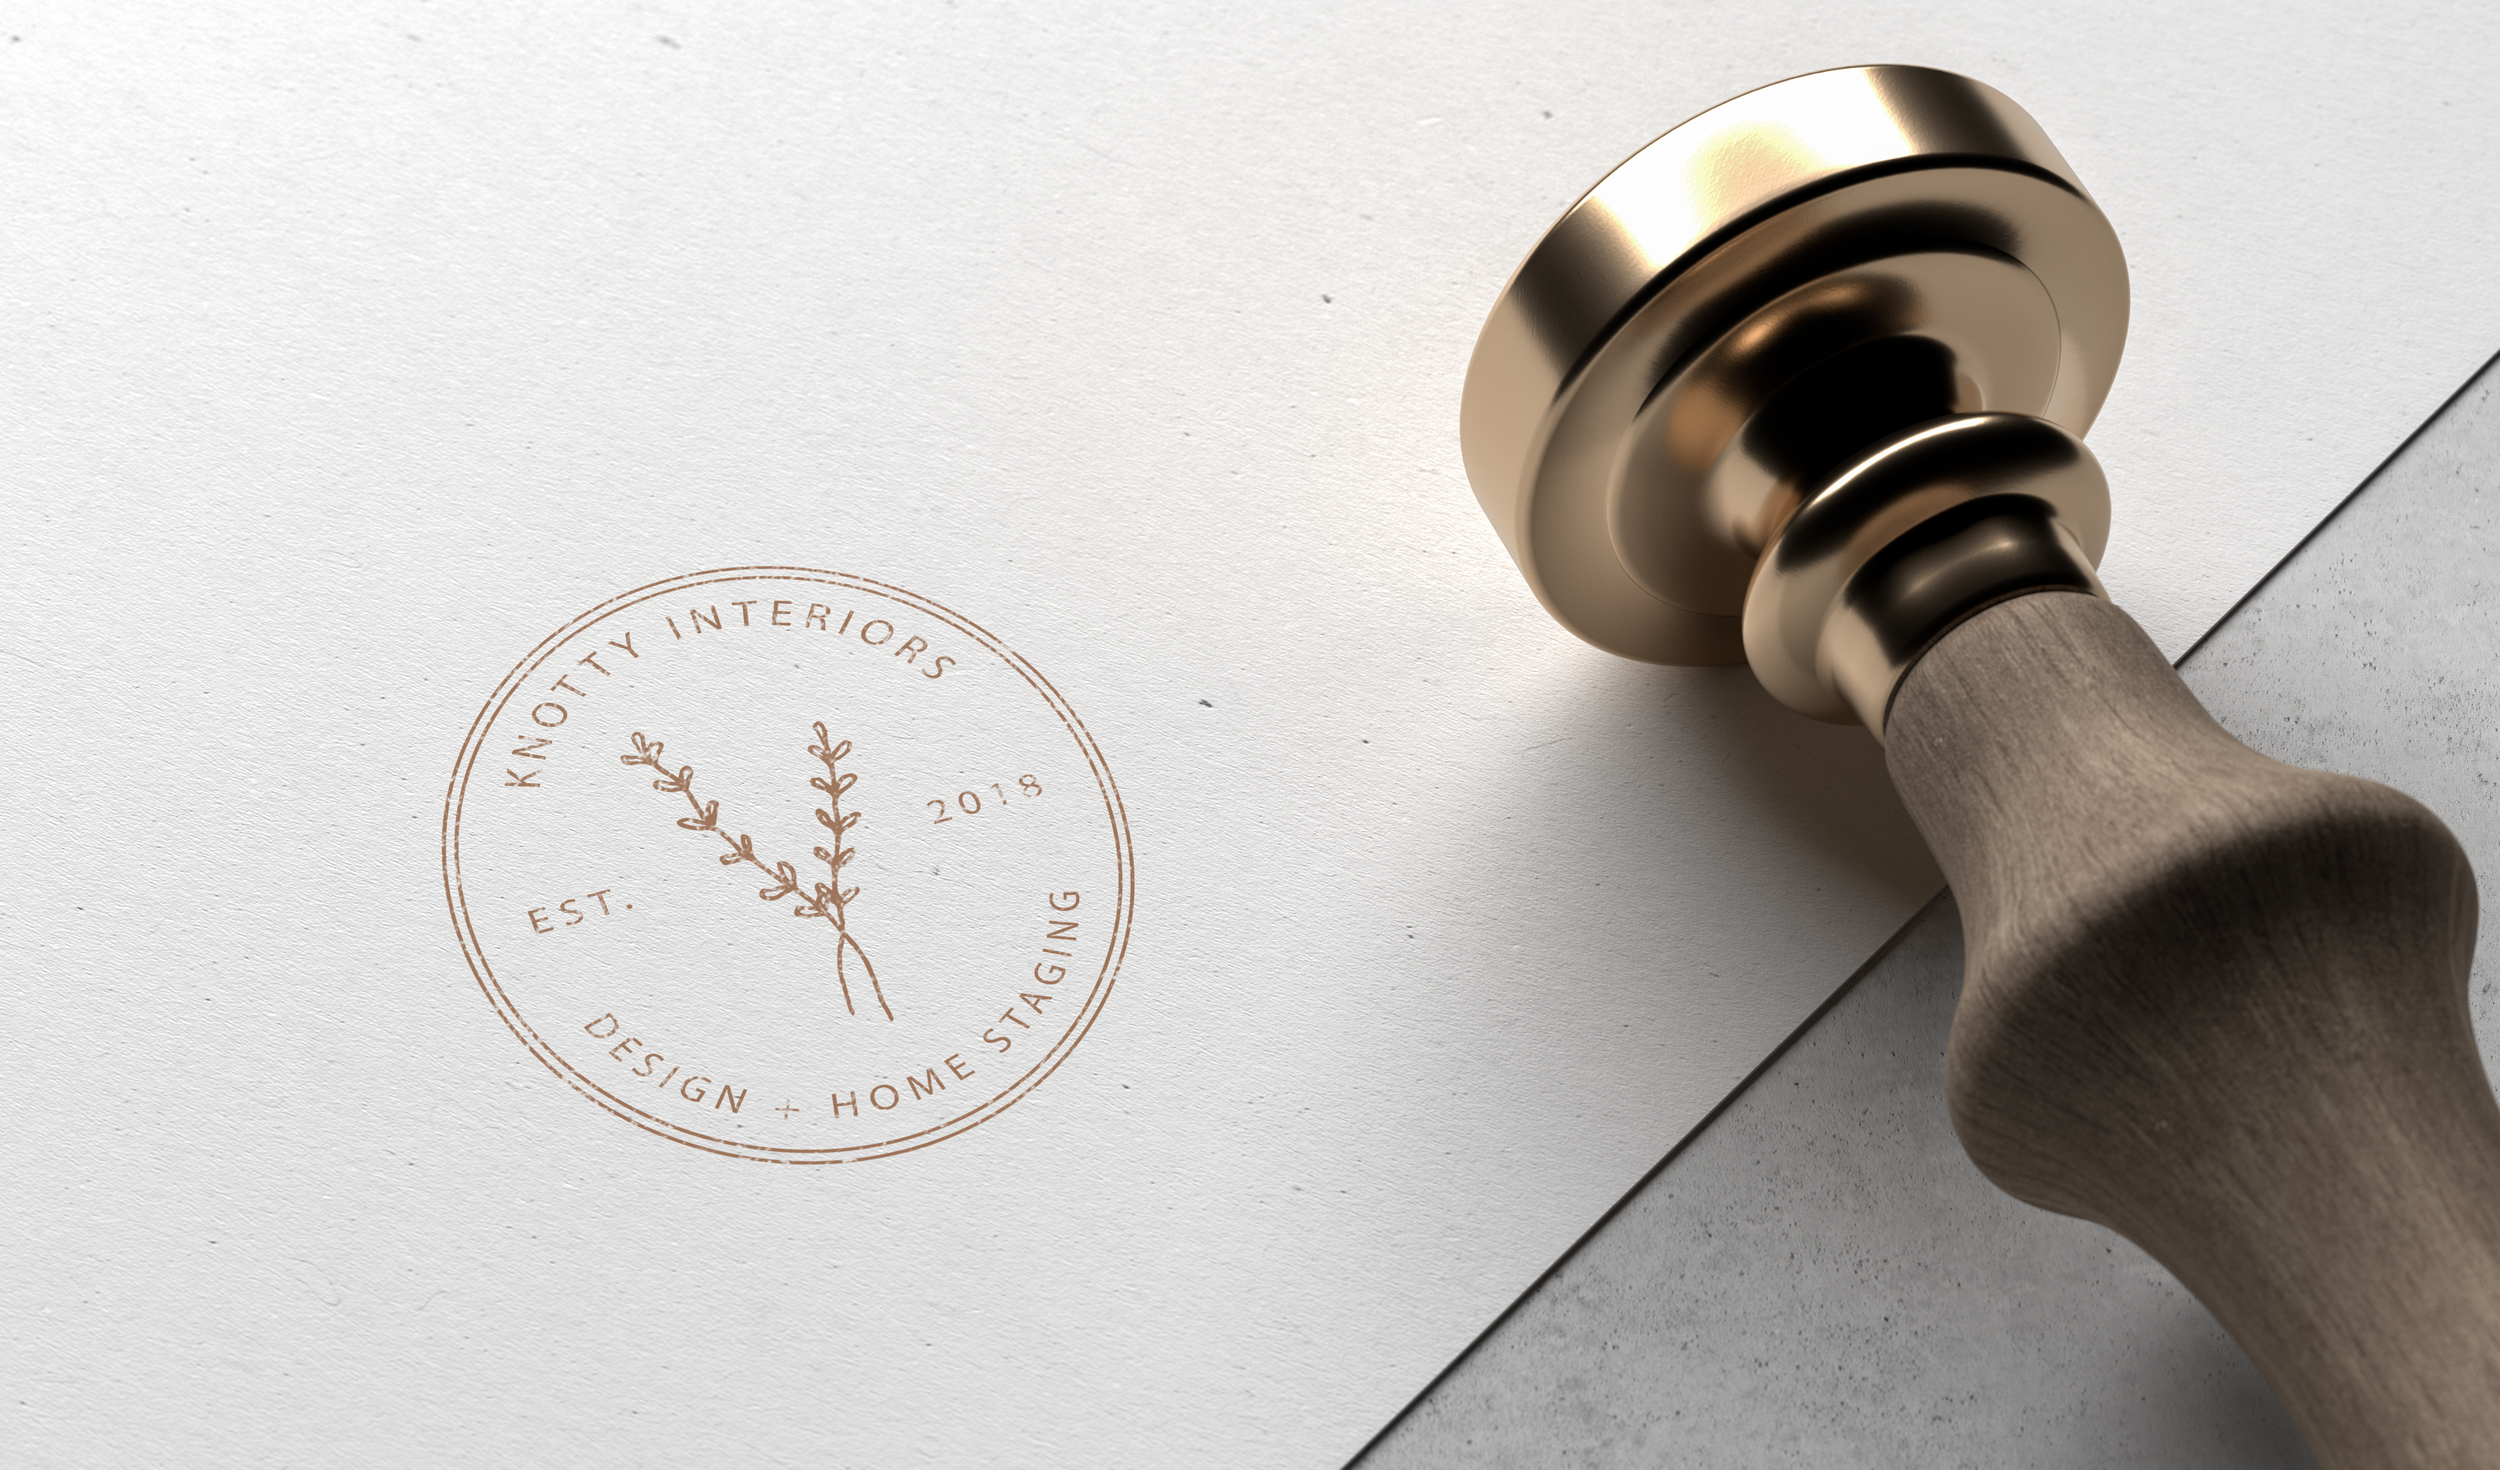 squarespace-logo-designer